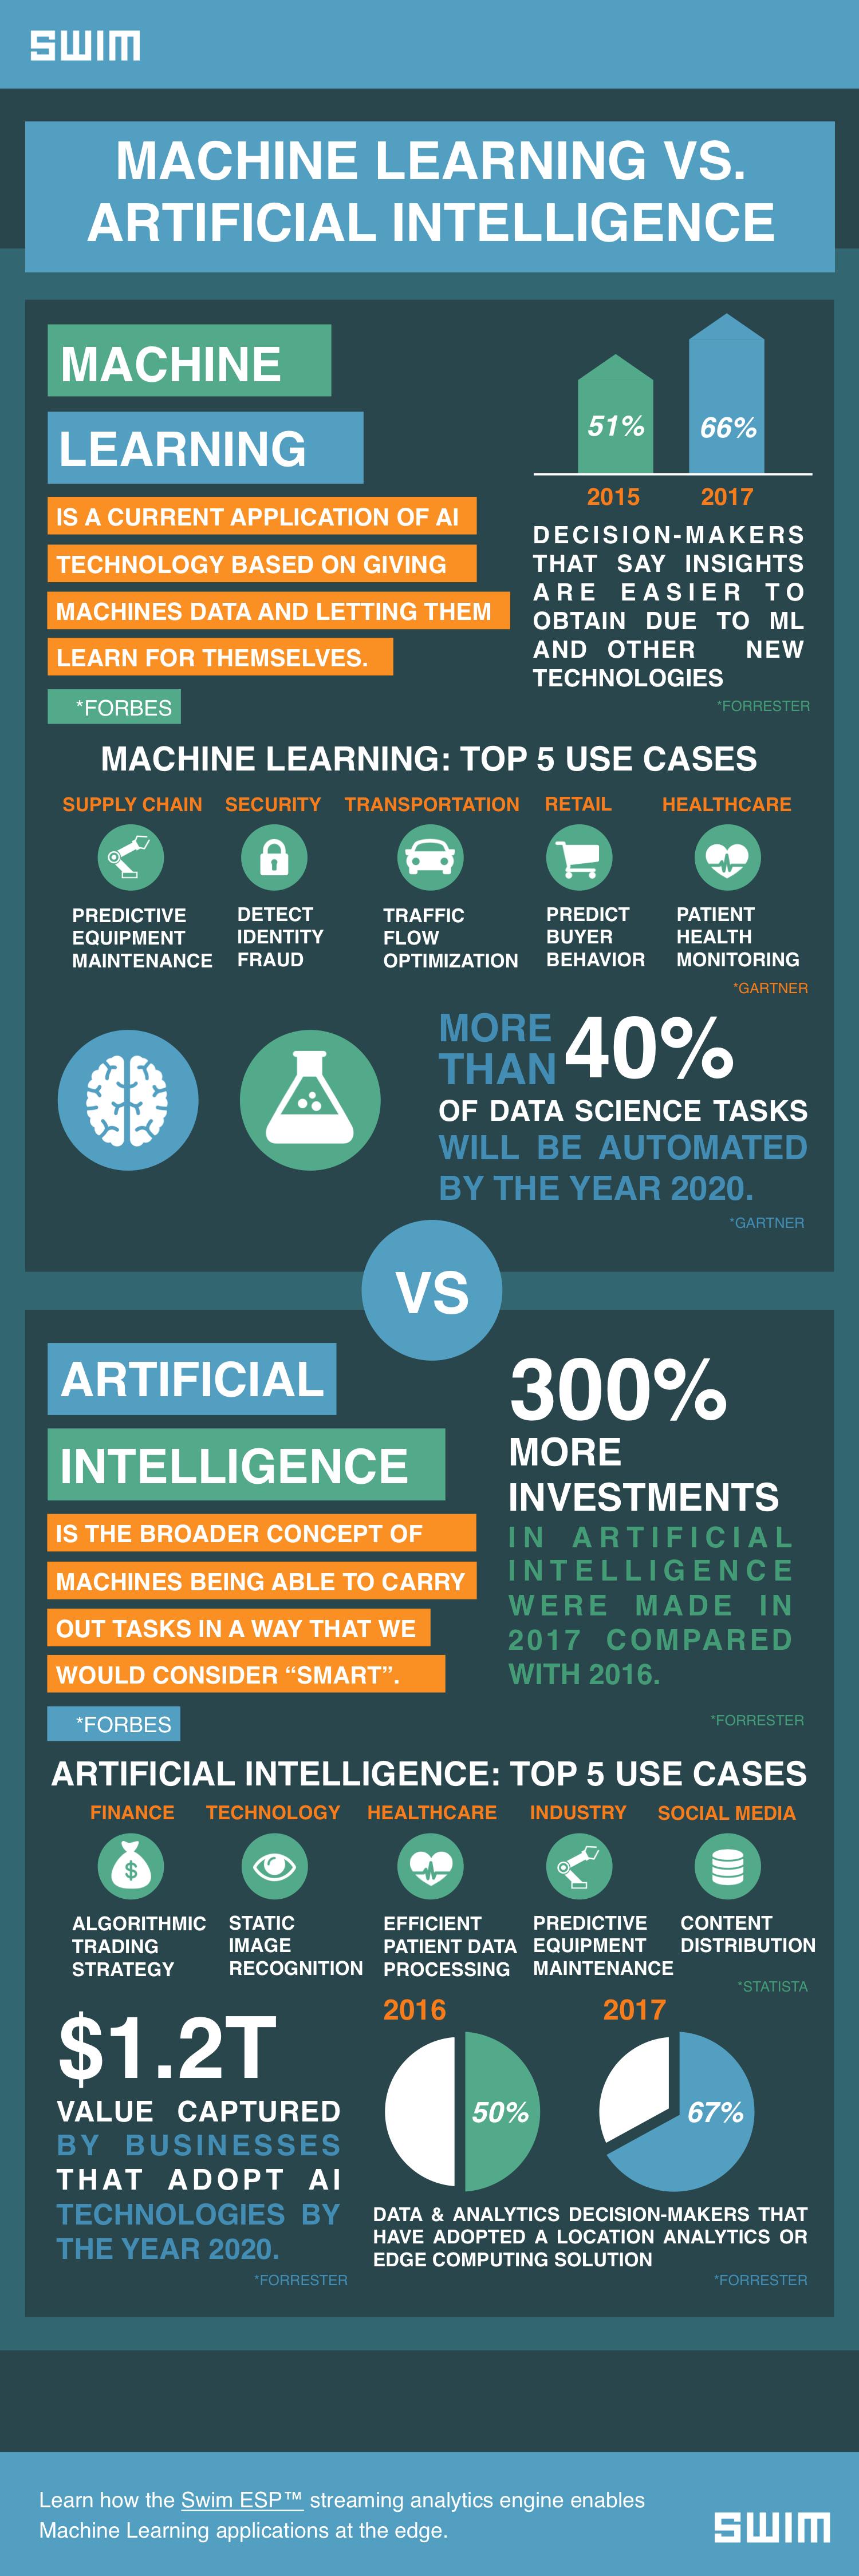 Swim_Machine Learning_Infographic